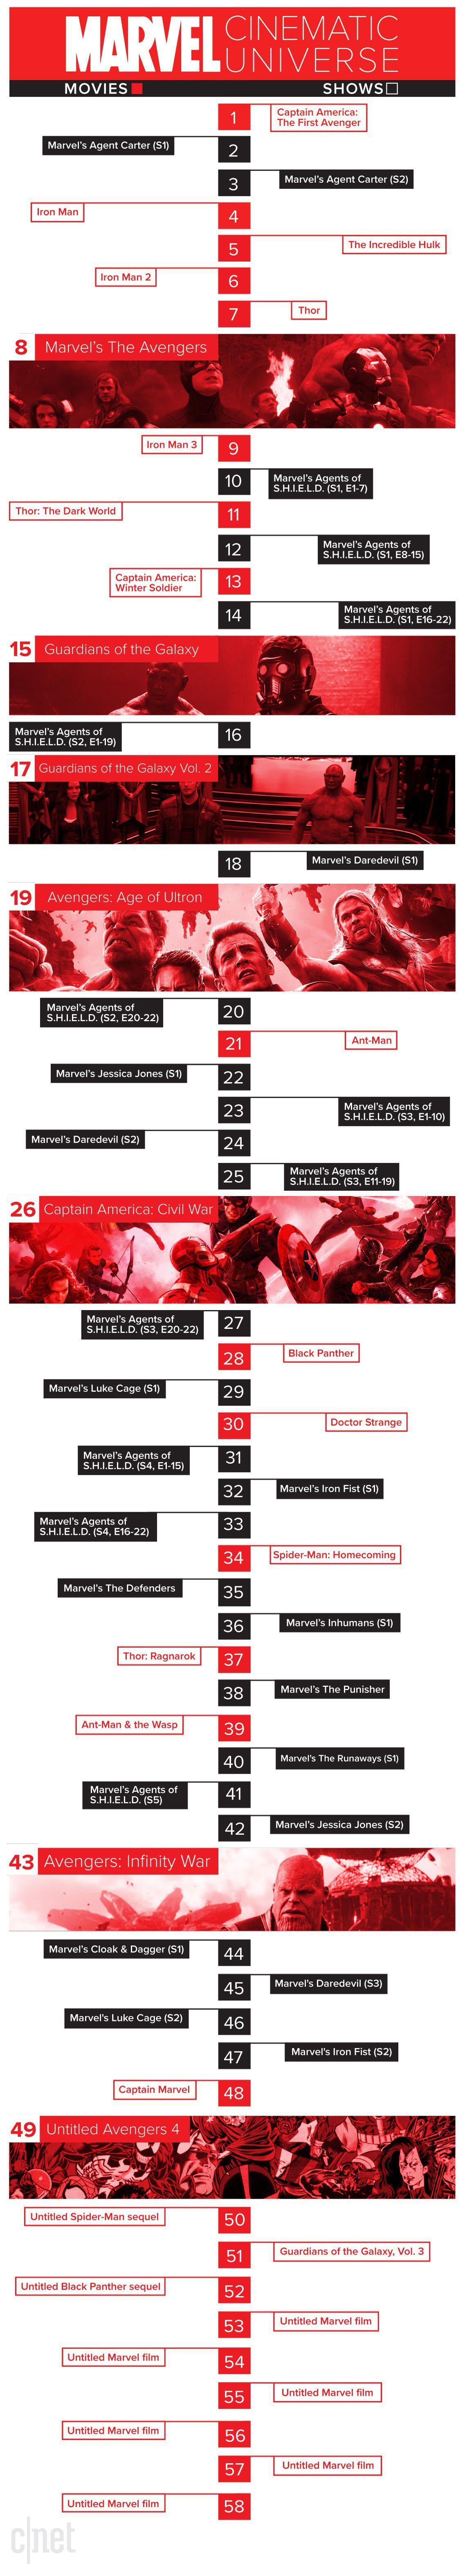 Alle Marvel Filme Und Serien In Der Richtigen Reihenfolge Bis 2019 Blogbusters Marvel Marvel Filme Reihenfolge Superhelden Filme